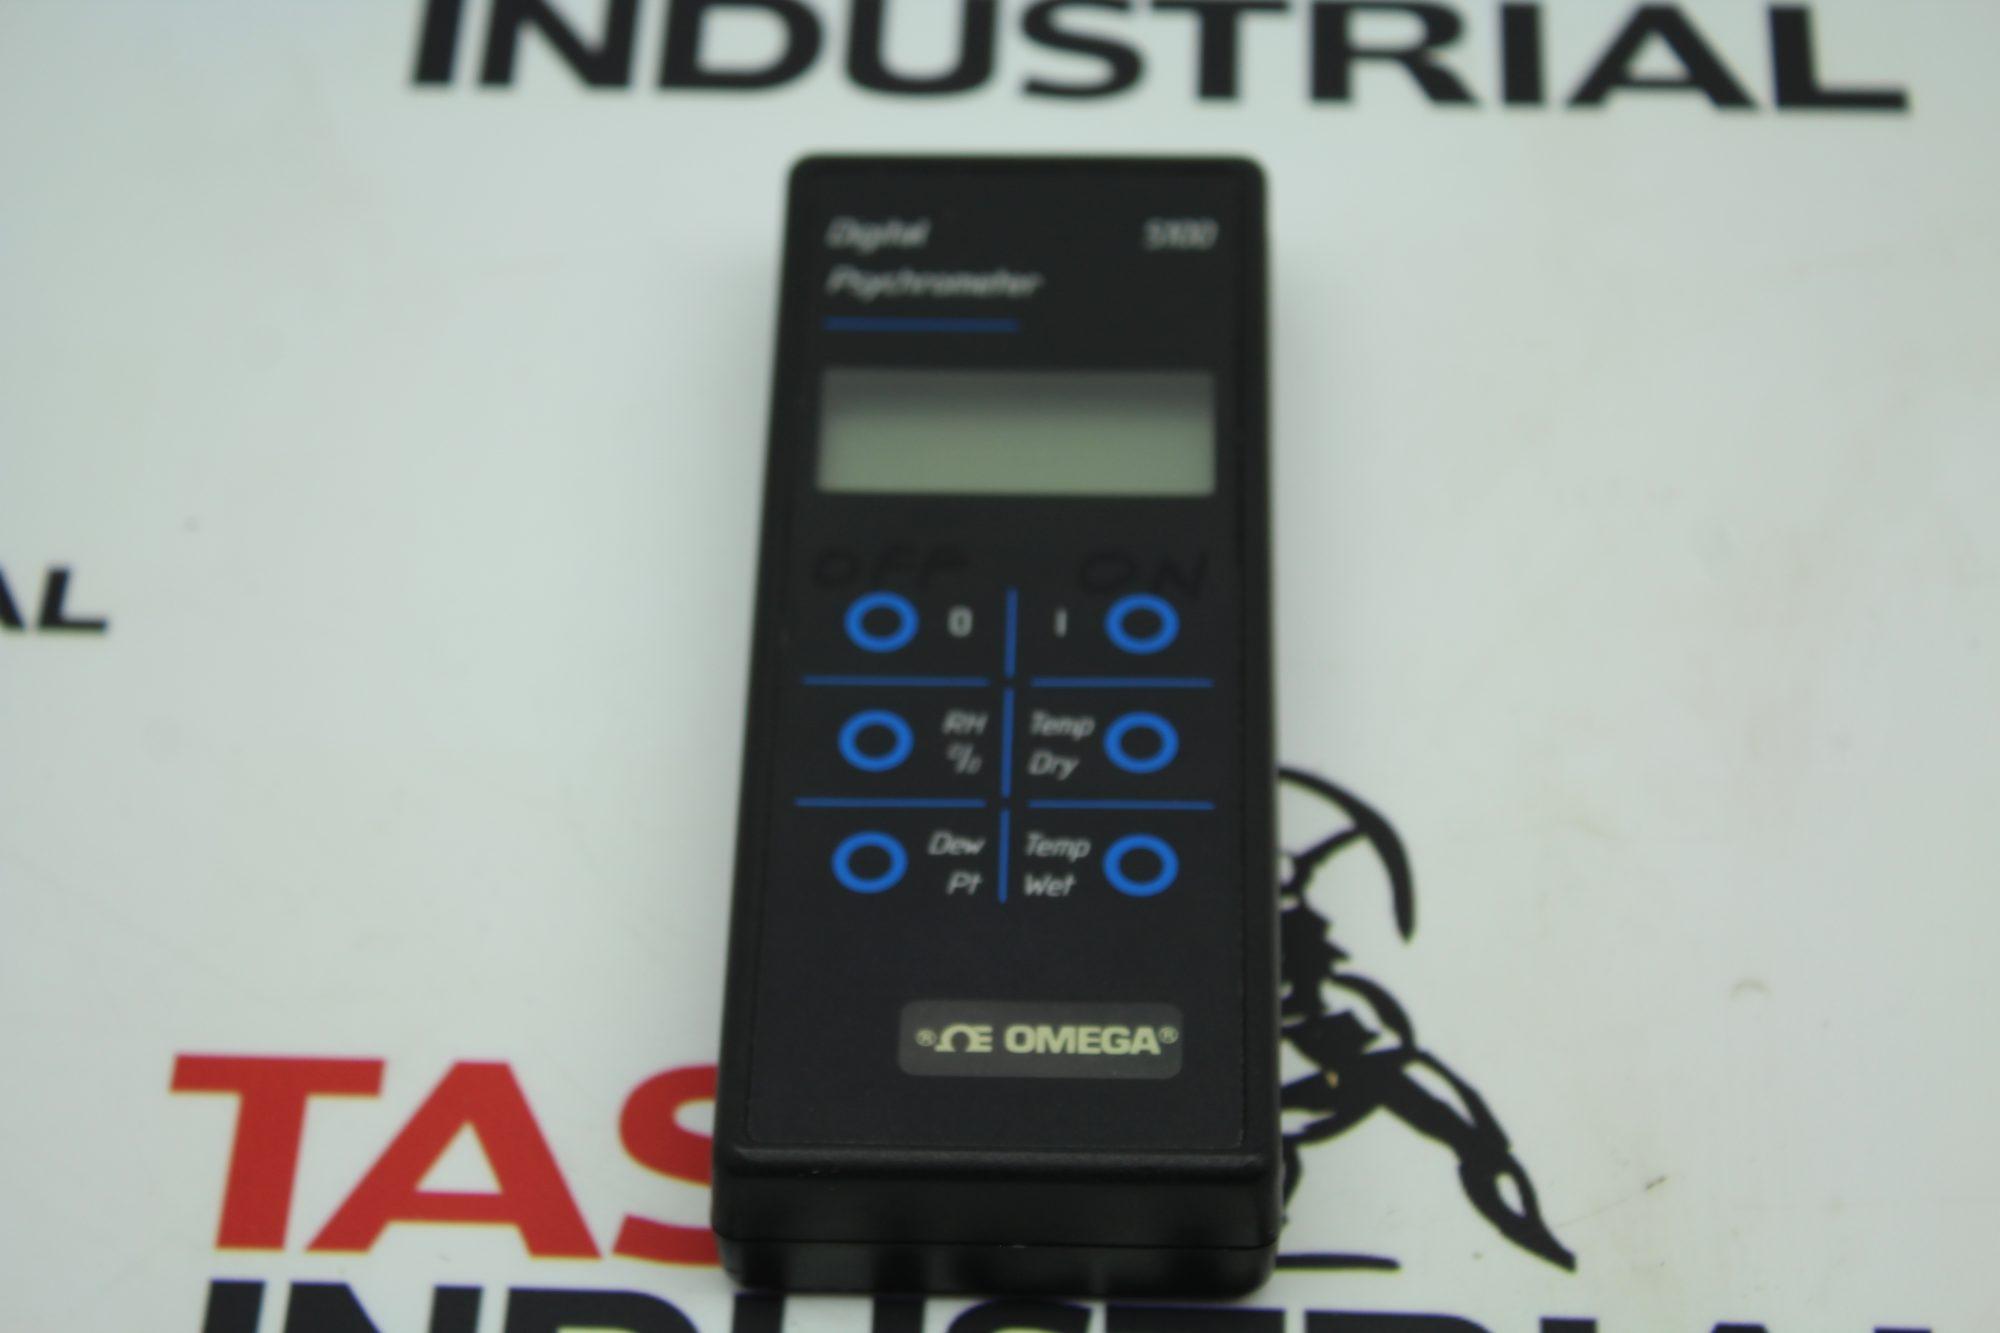 Omega Model 5100 Digital Psychrometer Keypad Only